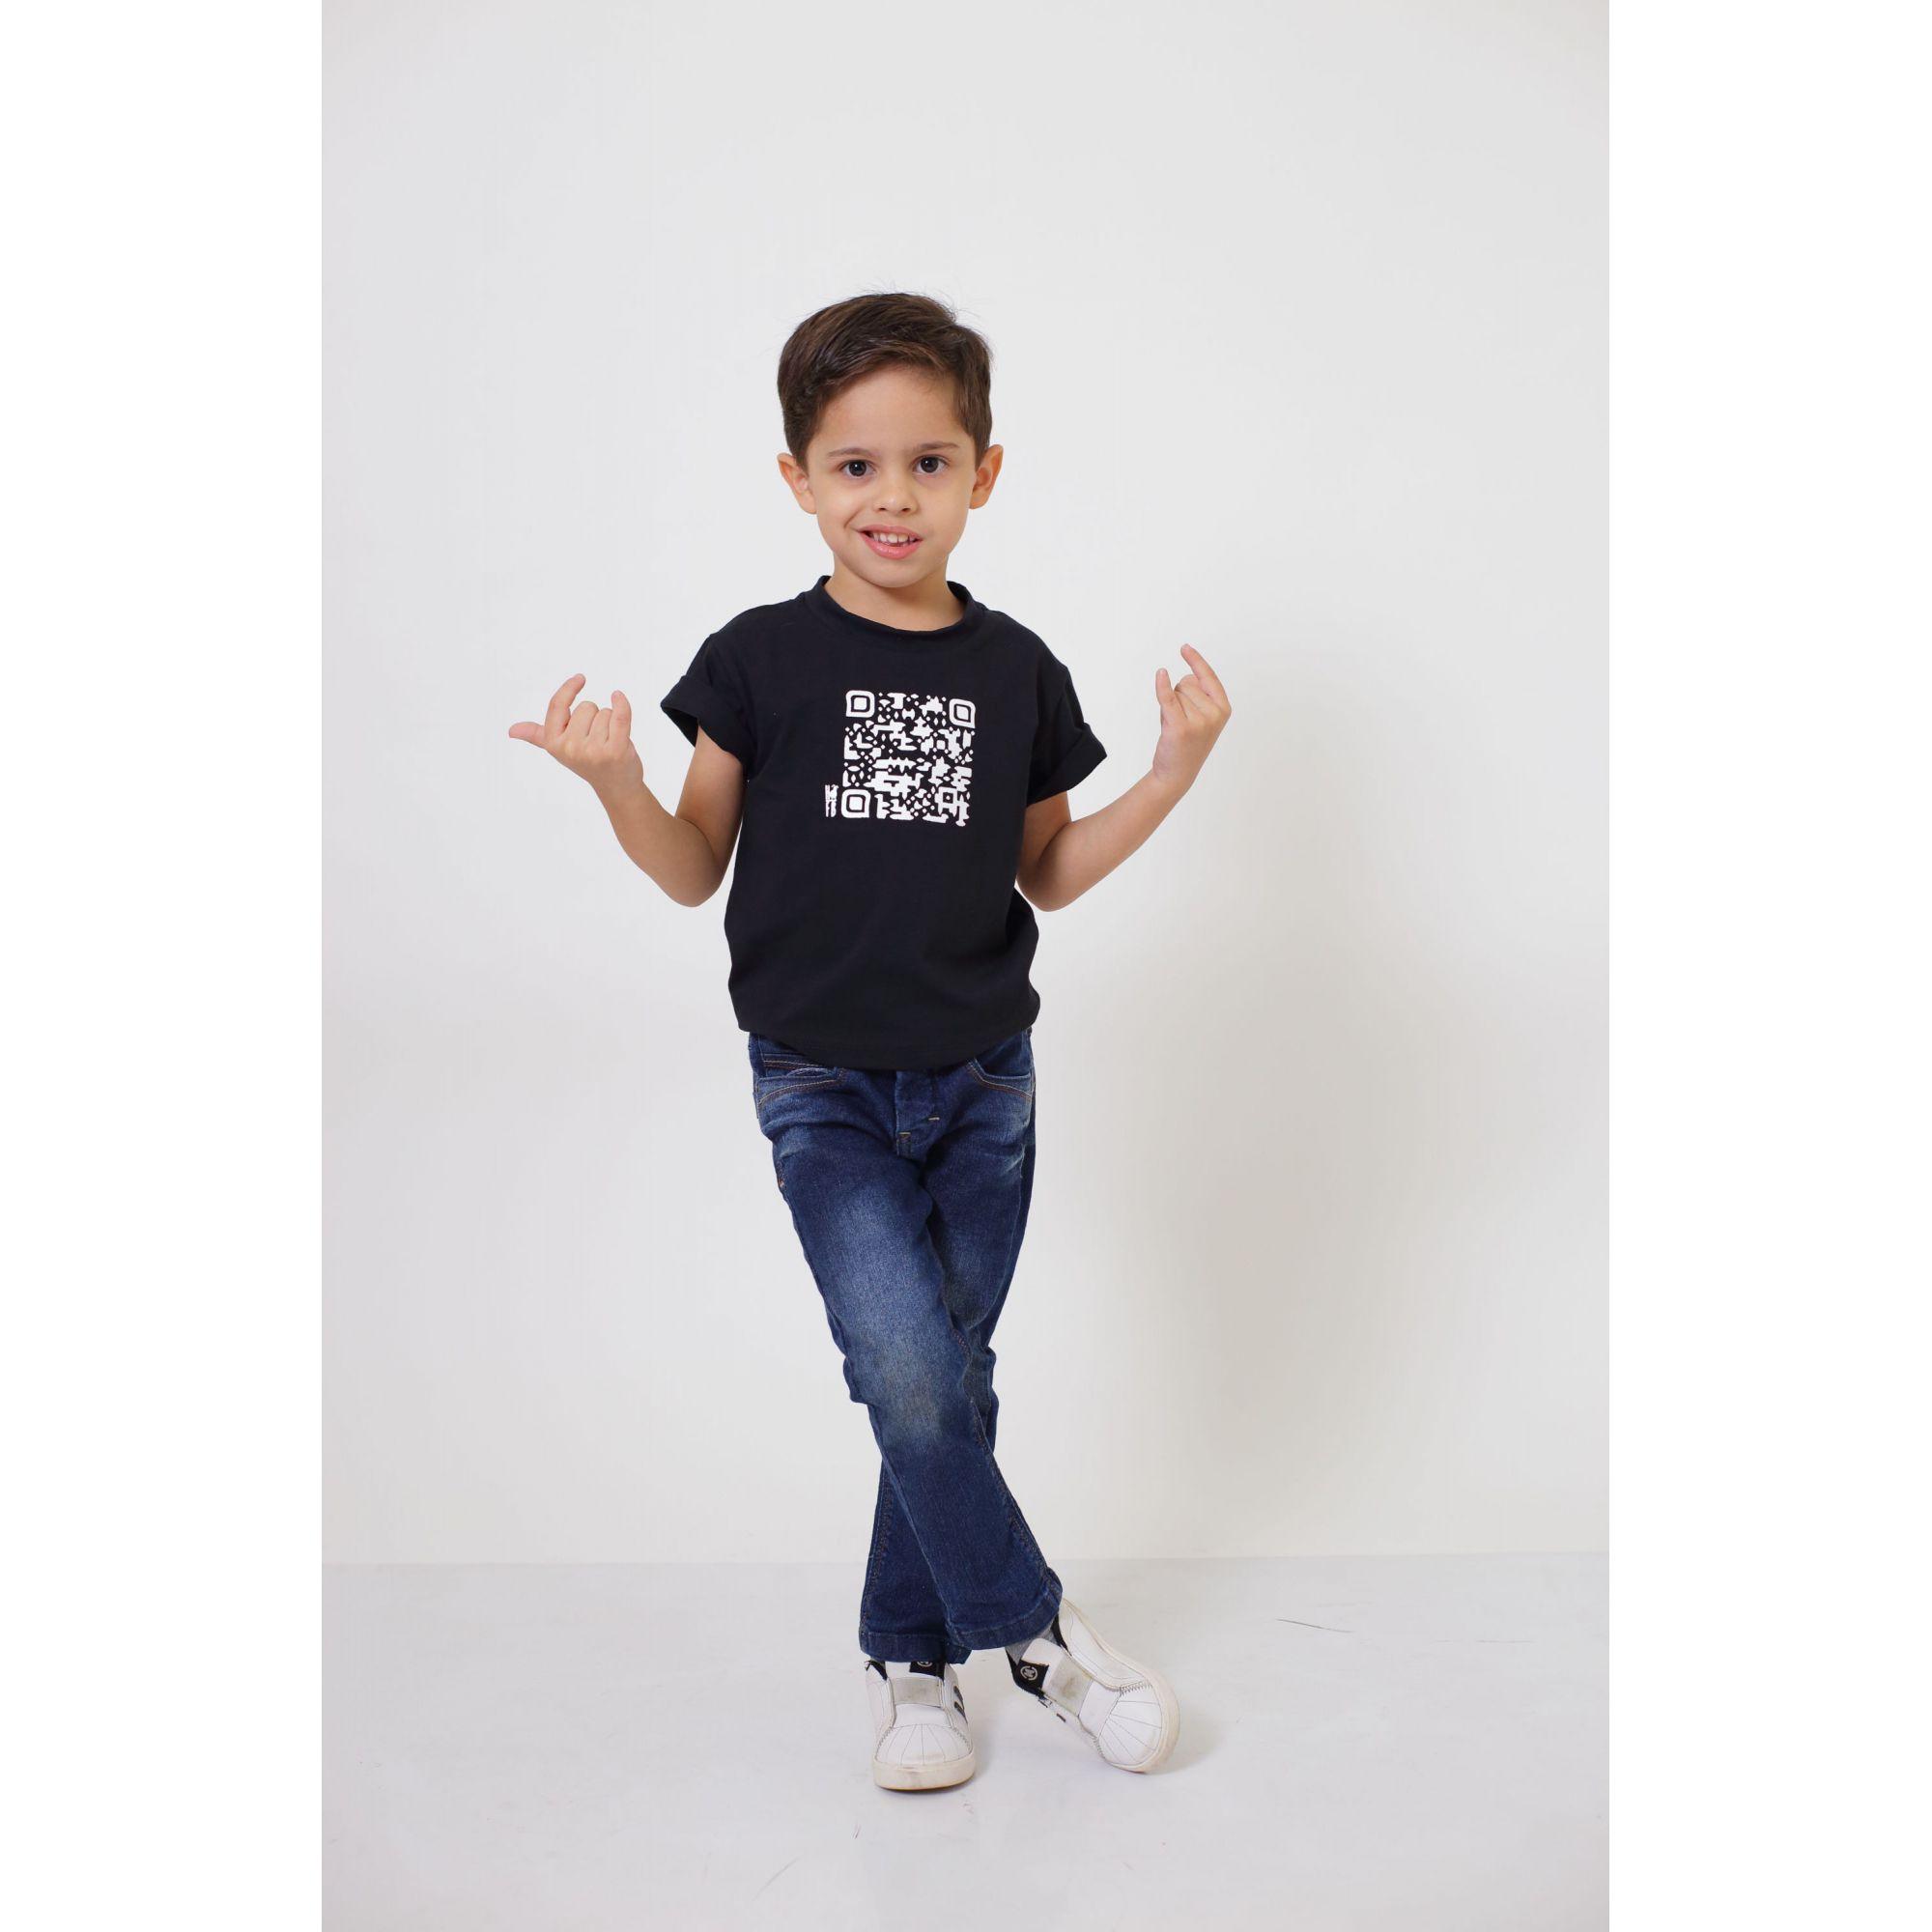 Camiseta ou Body Infantil Unissex - QRCODE